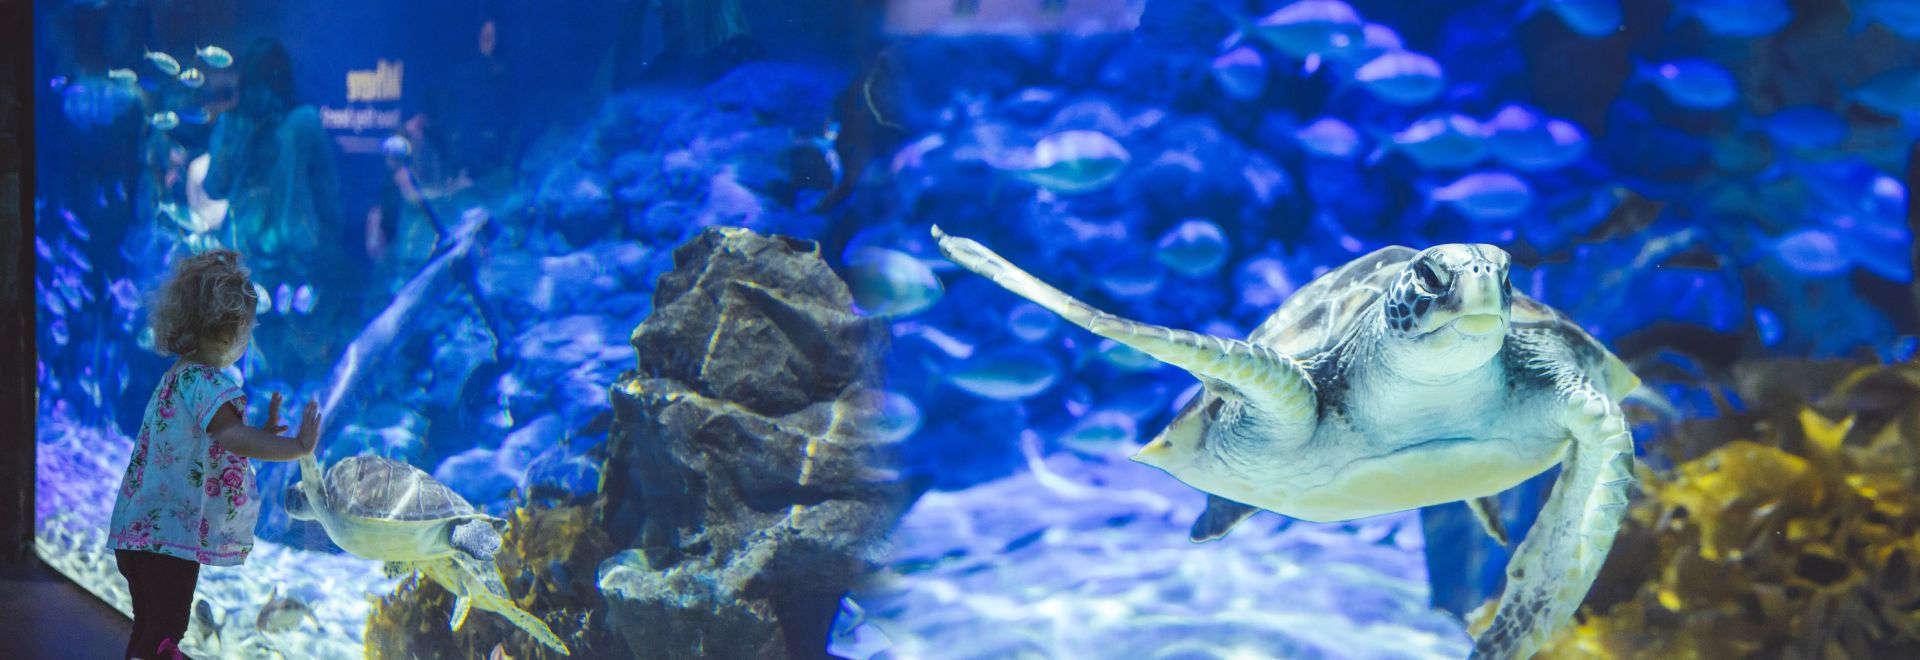 Kelly Tarlton's Sea Life Aquarium,Auckland,New Zealand @Freedom Tourism